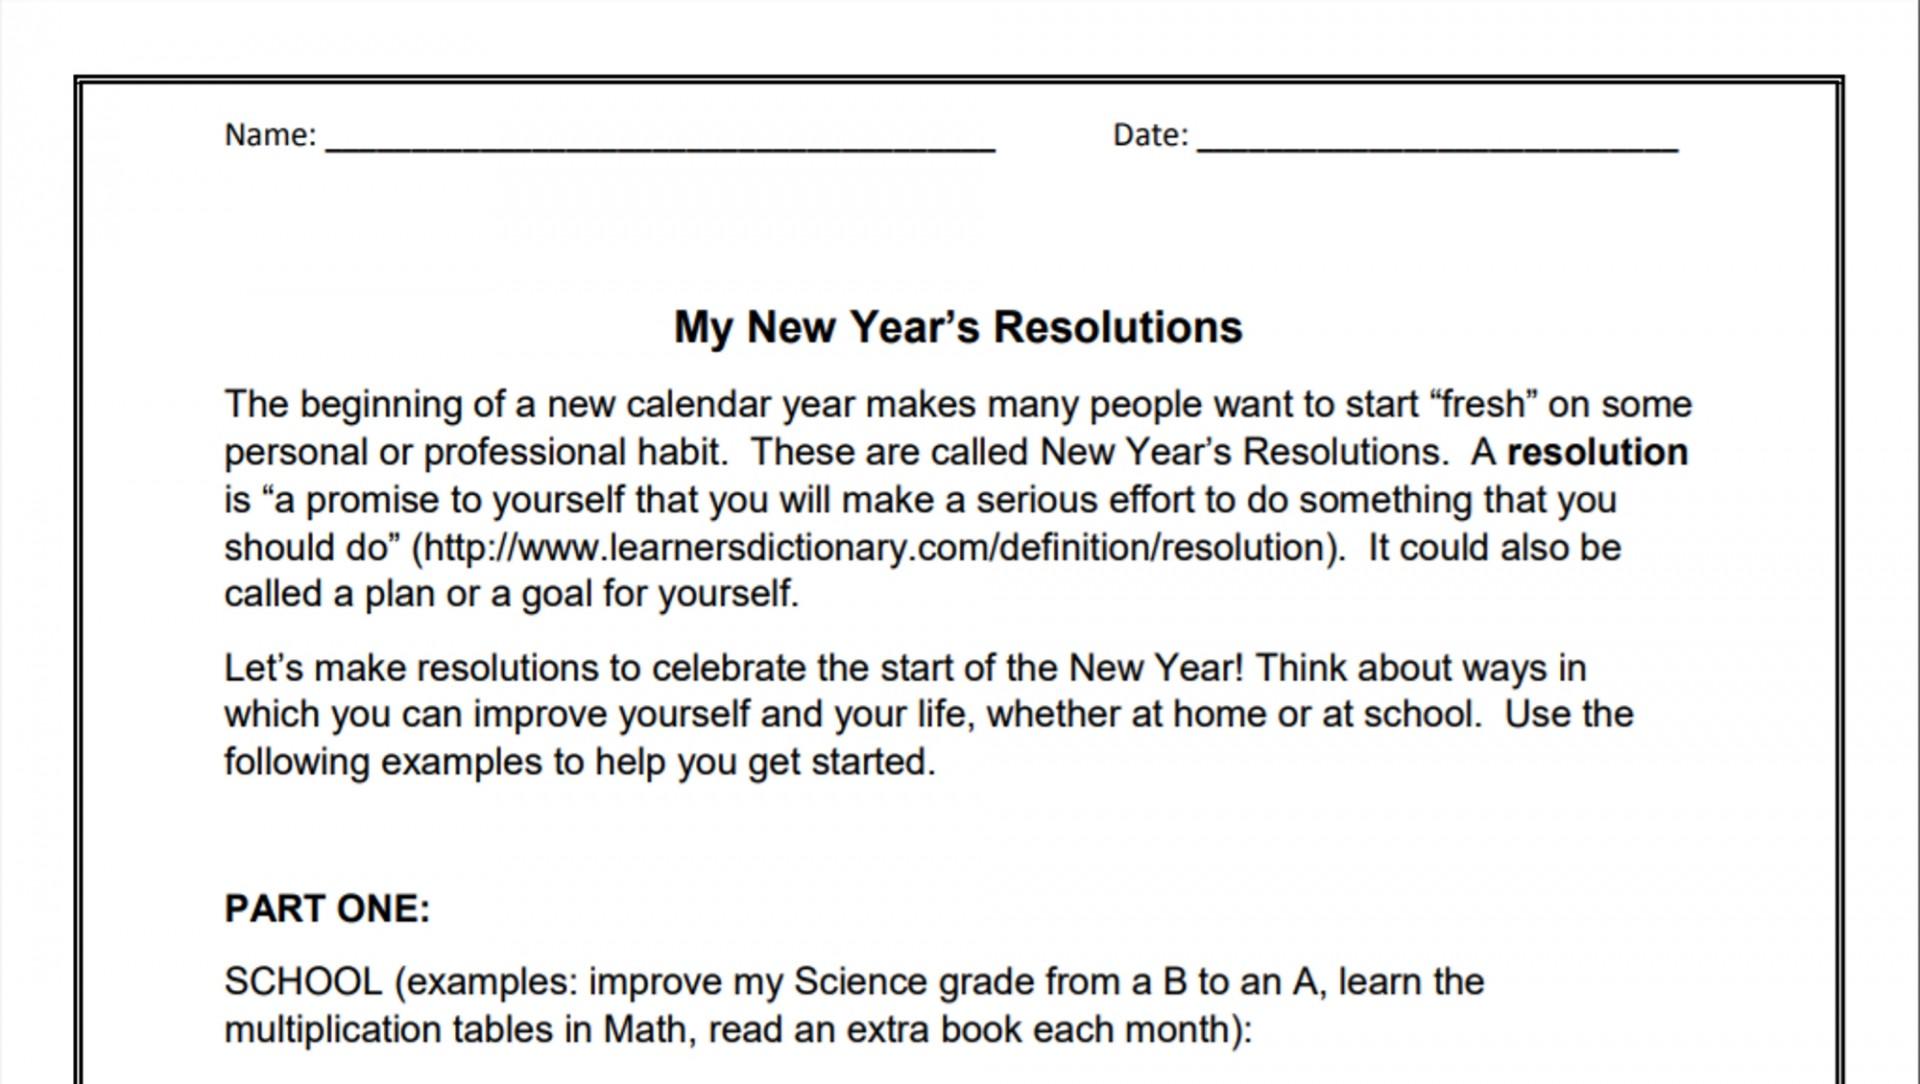 010 My New Year Resolution Essay Singular High School Student 2019 For Class 5 1920